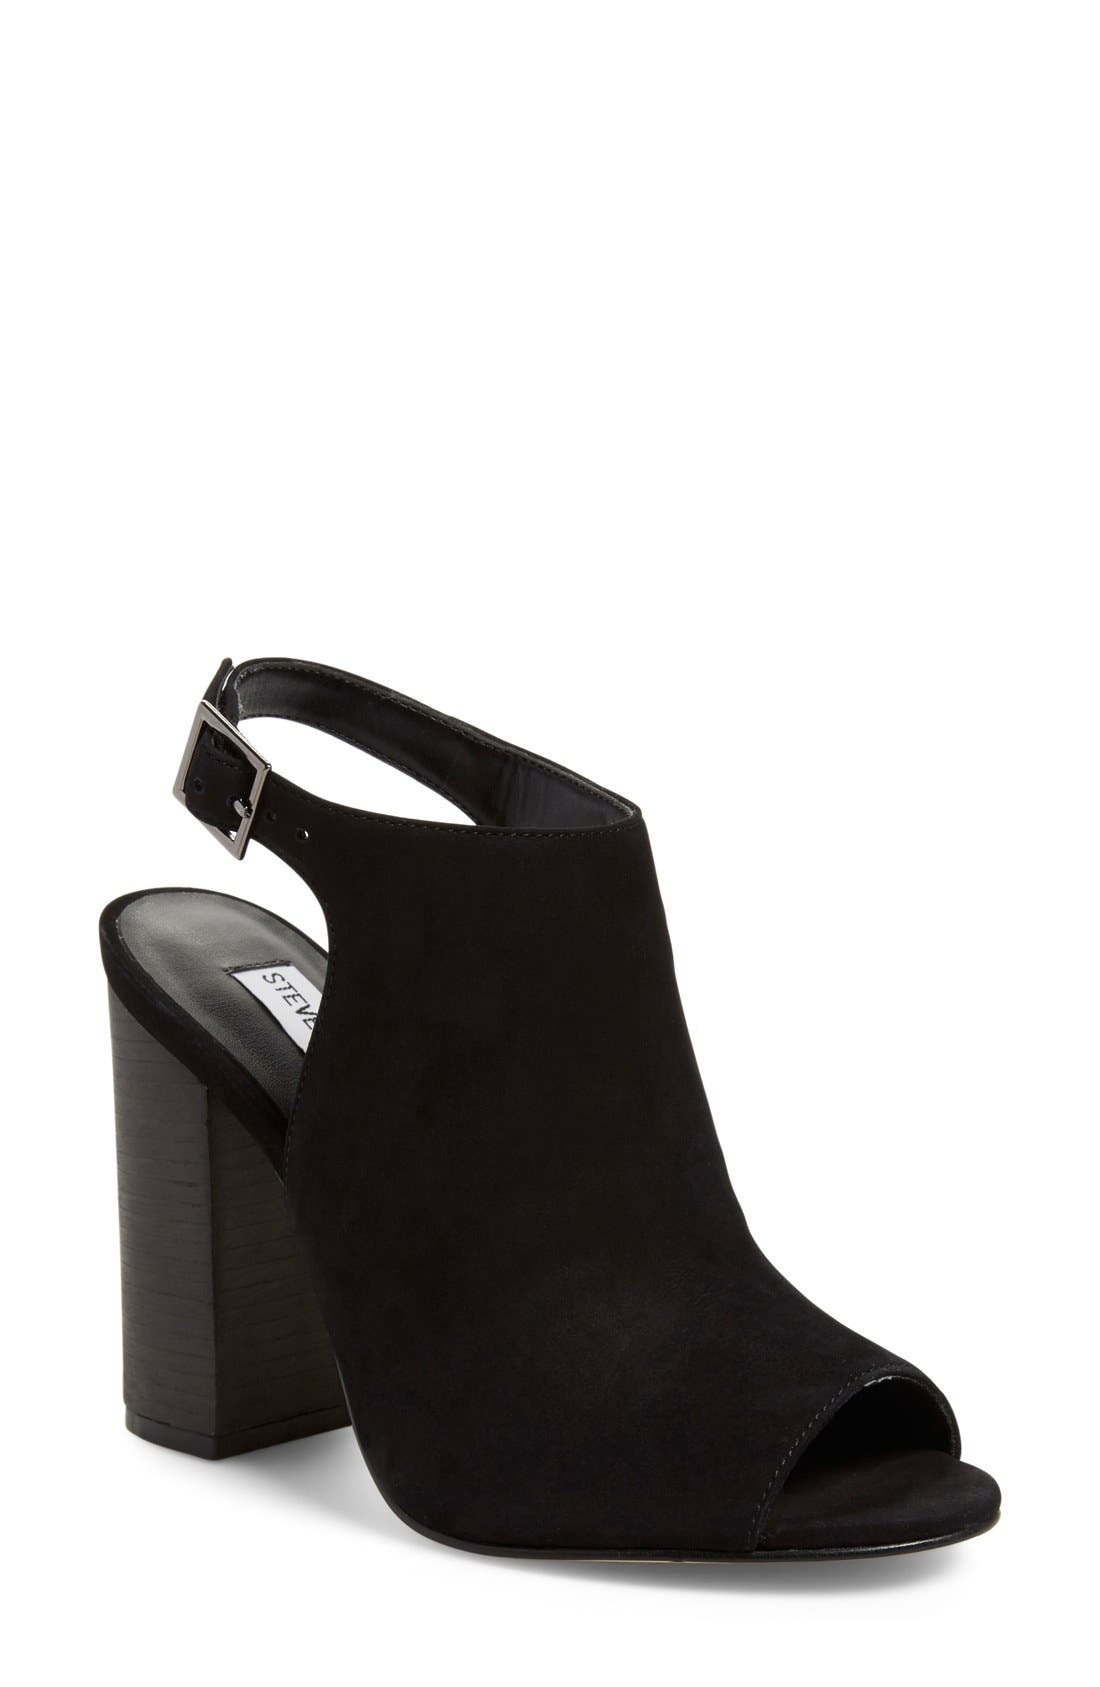 'Claara' Block Heel Sandal,                             Main thumbnail 1, color,                             005